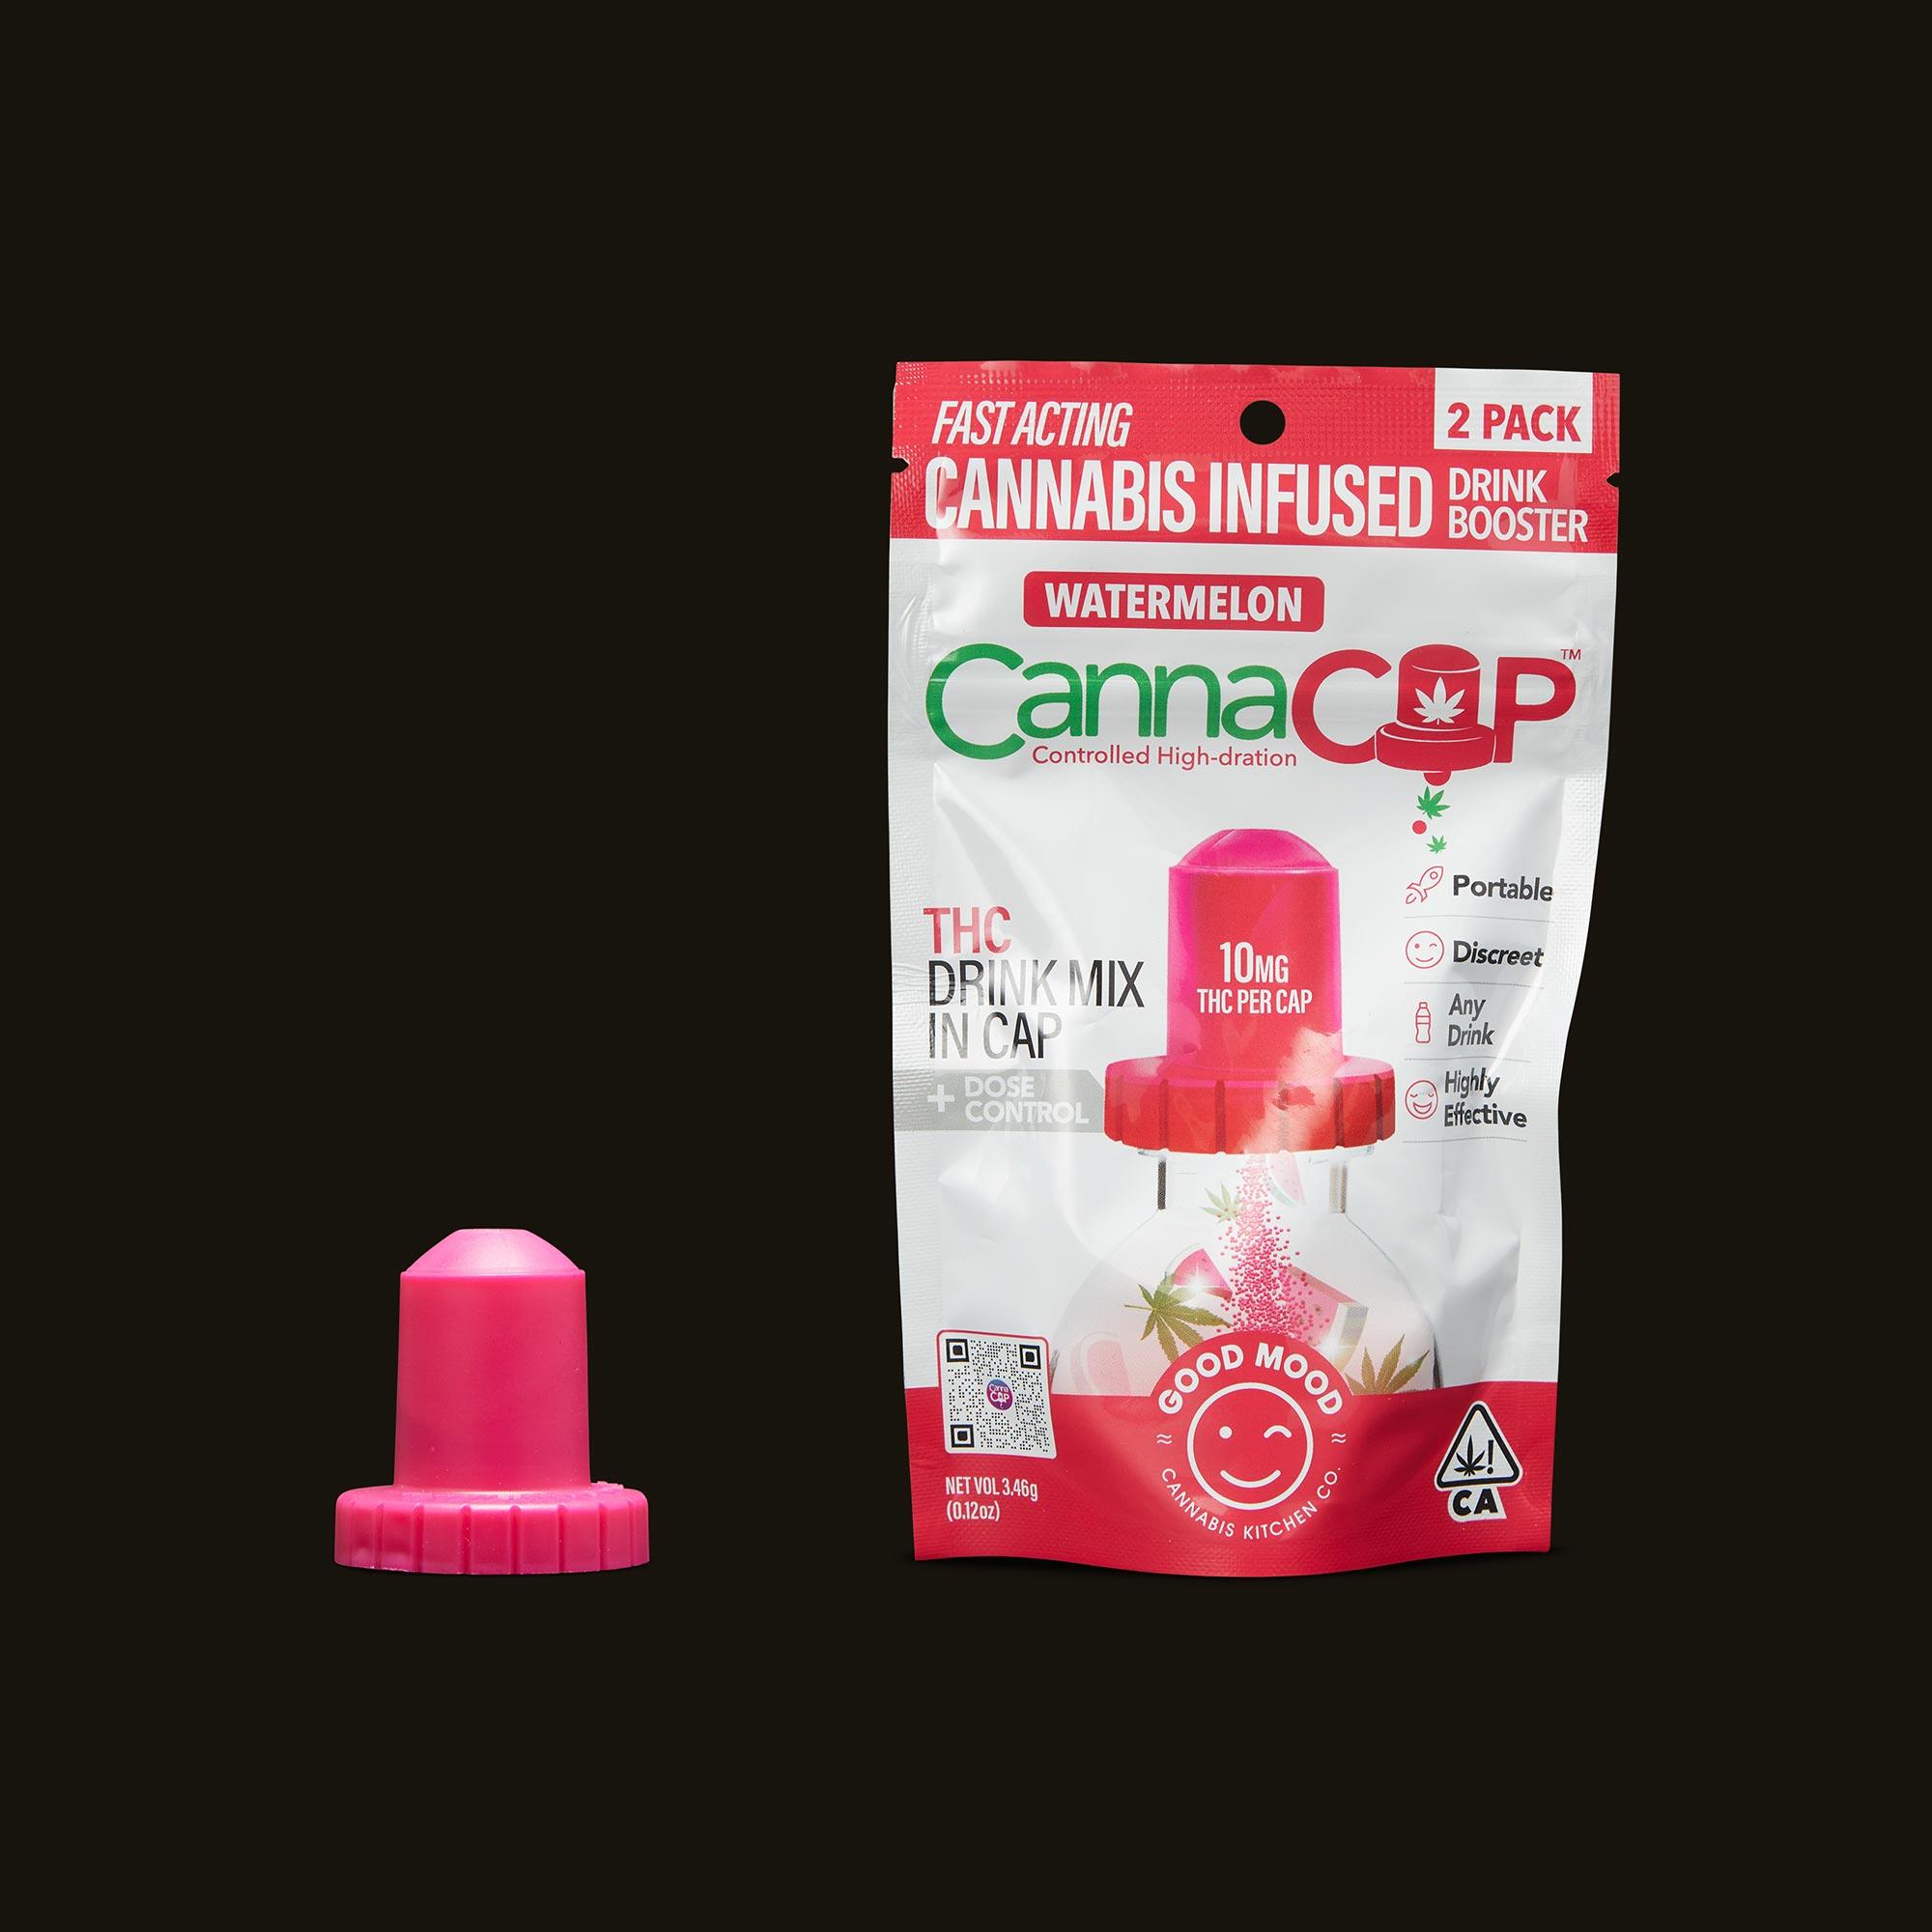 Good Mood Cannabis Kitchen Co. Watermelon CannaCap Drink Booster (2 Pack)